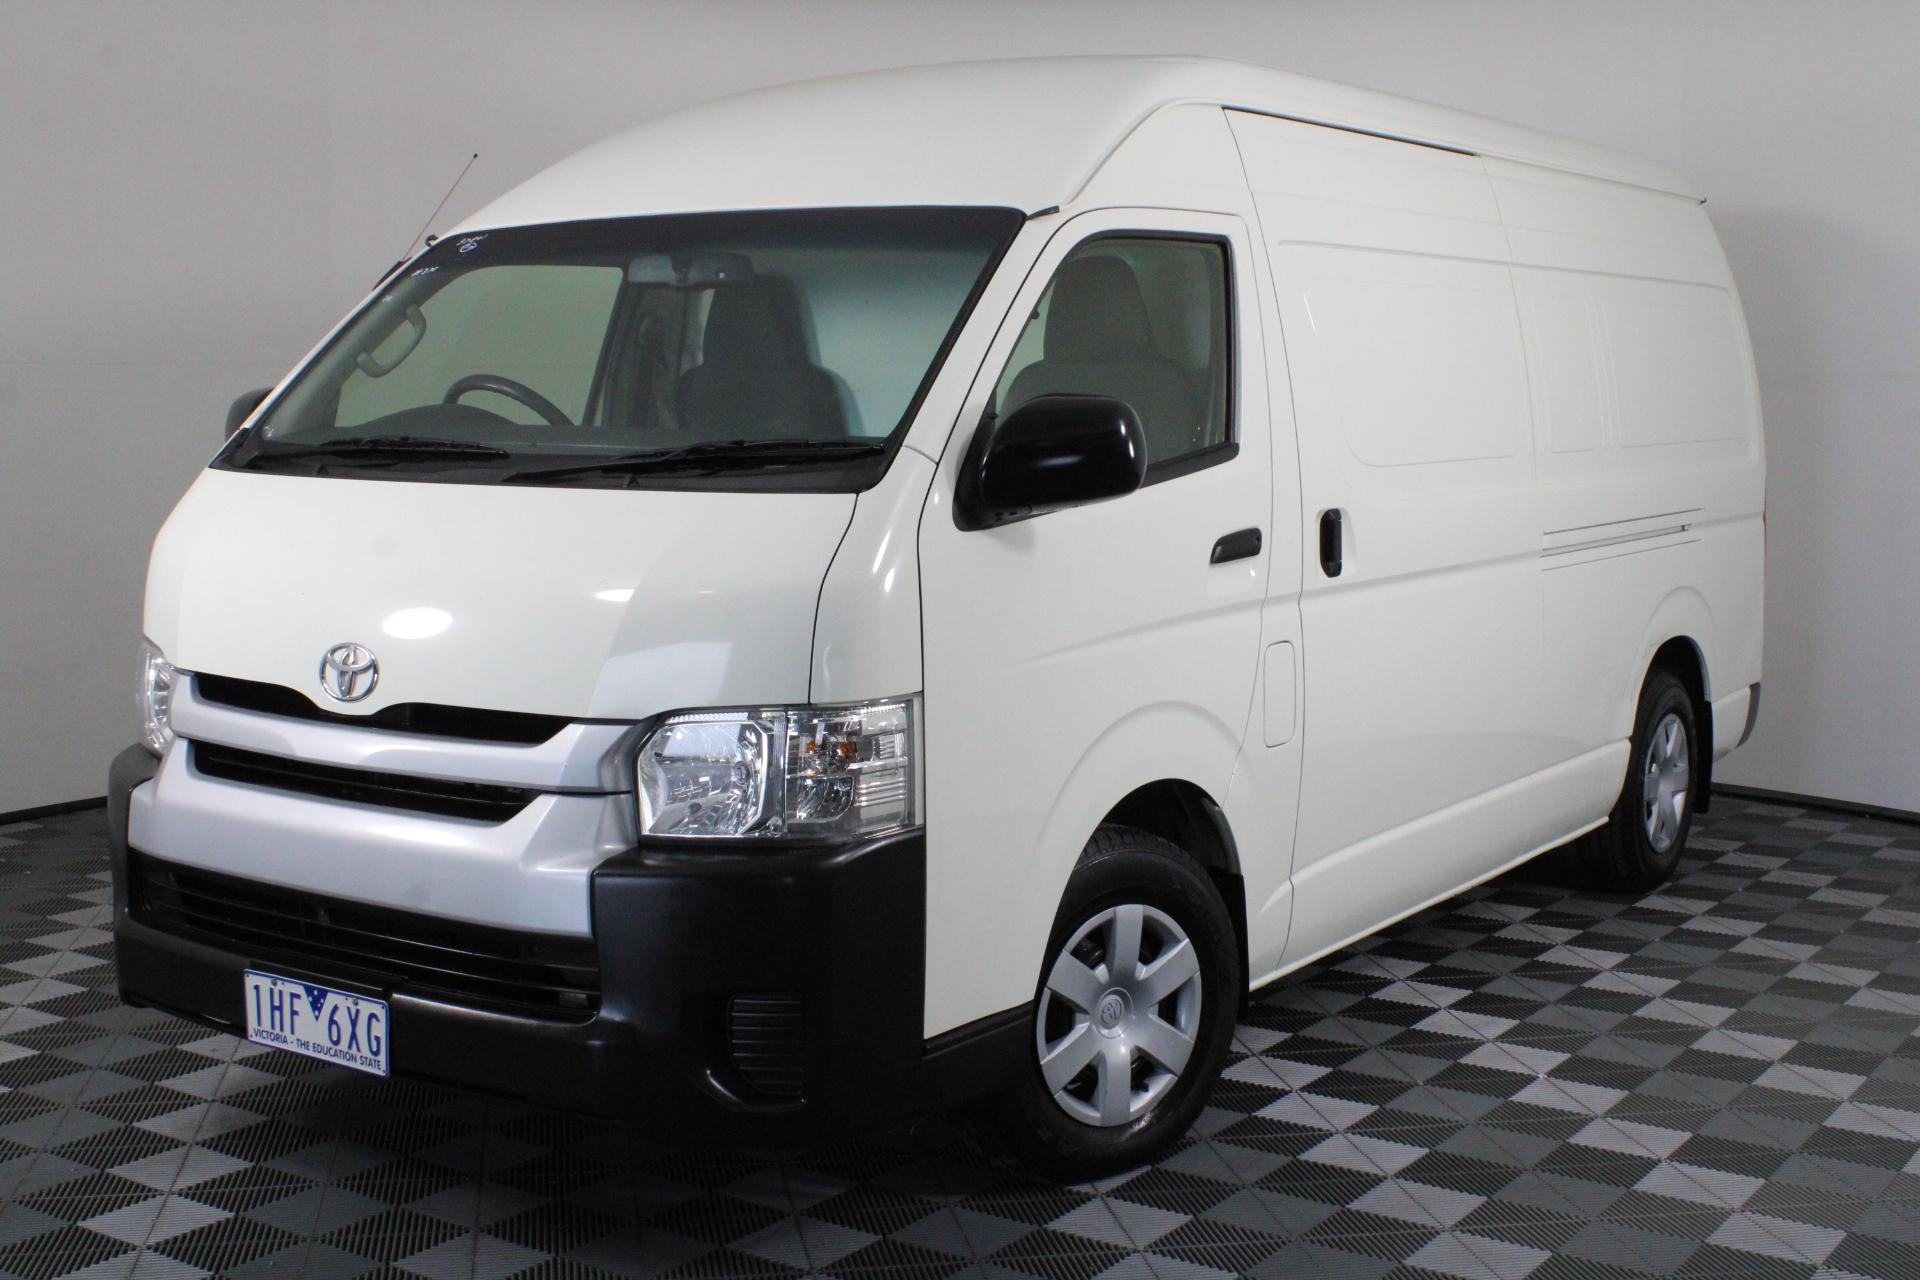 2015 Toyota Hiace SLWB Turbo Diesel Automatic Van (RWC issued: 20-1-20)